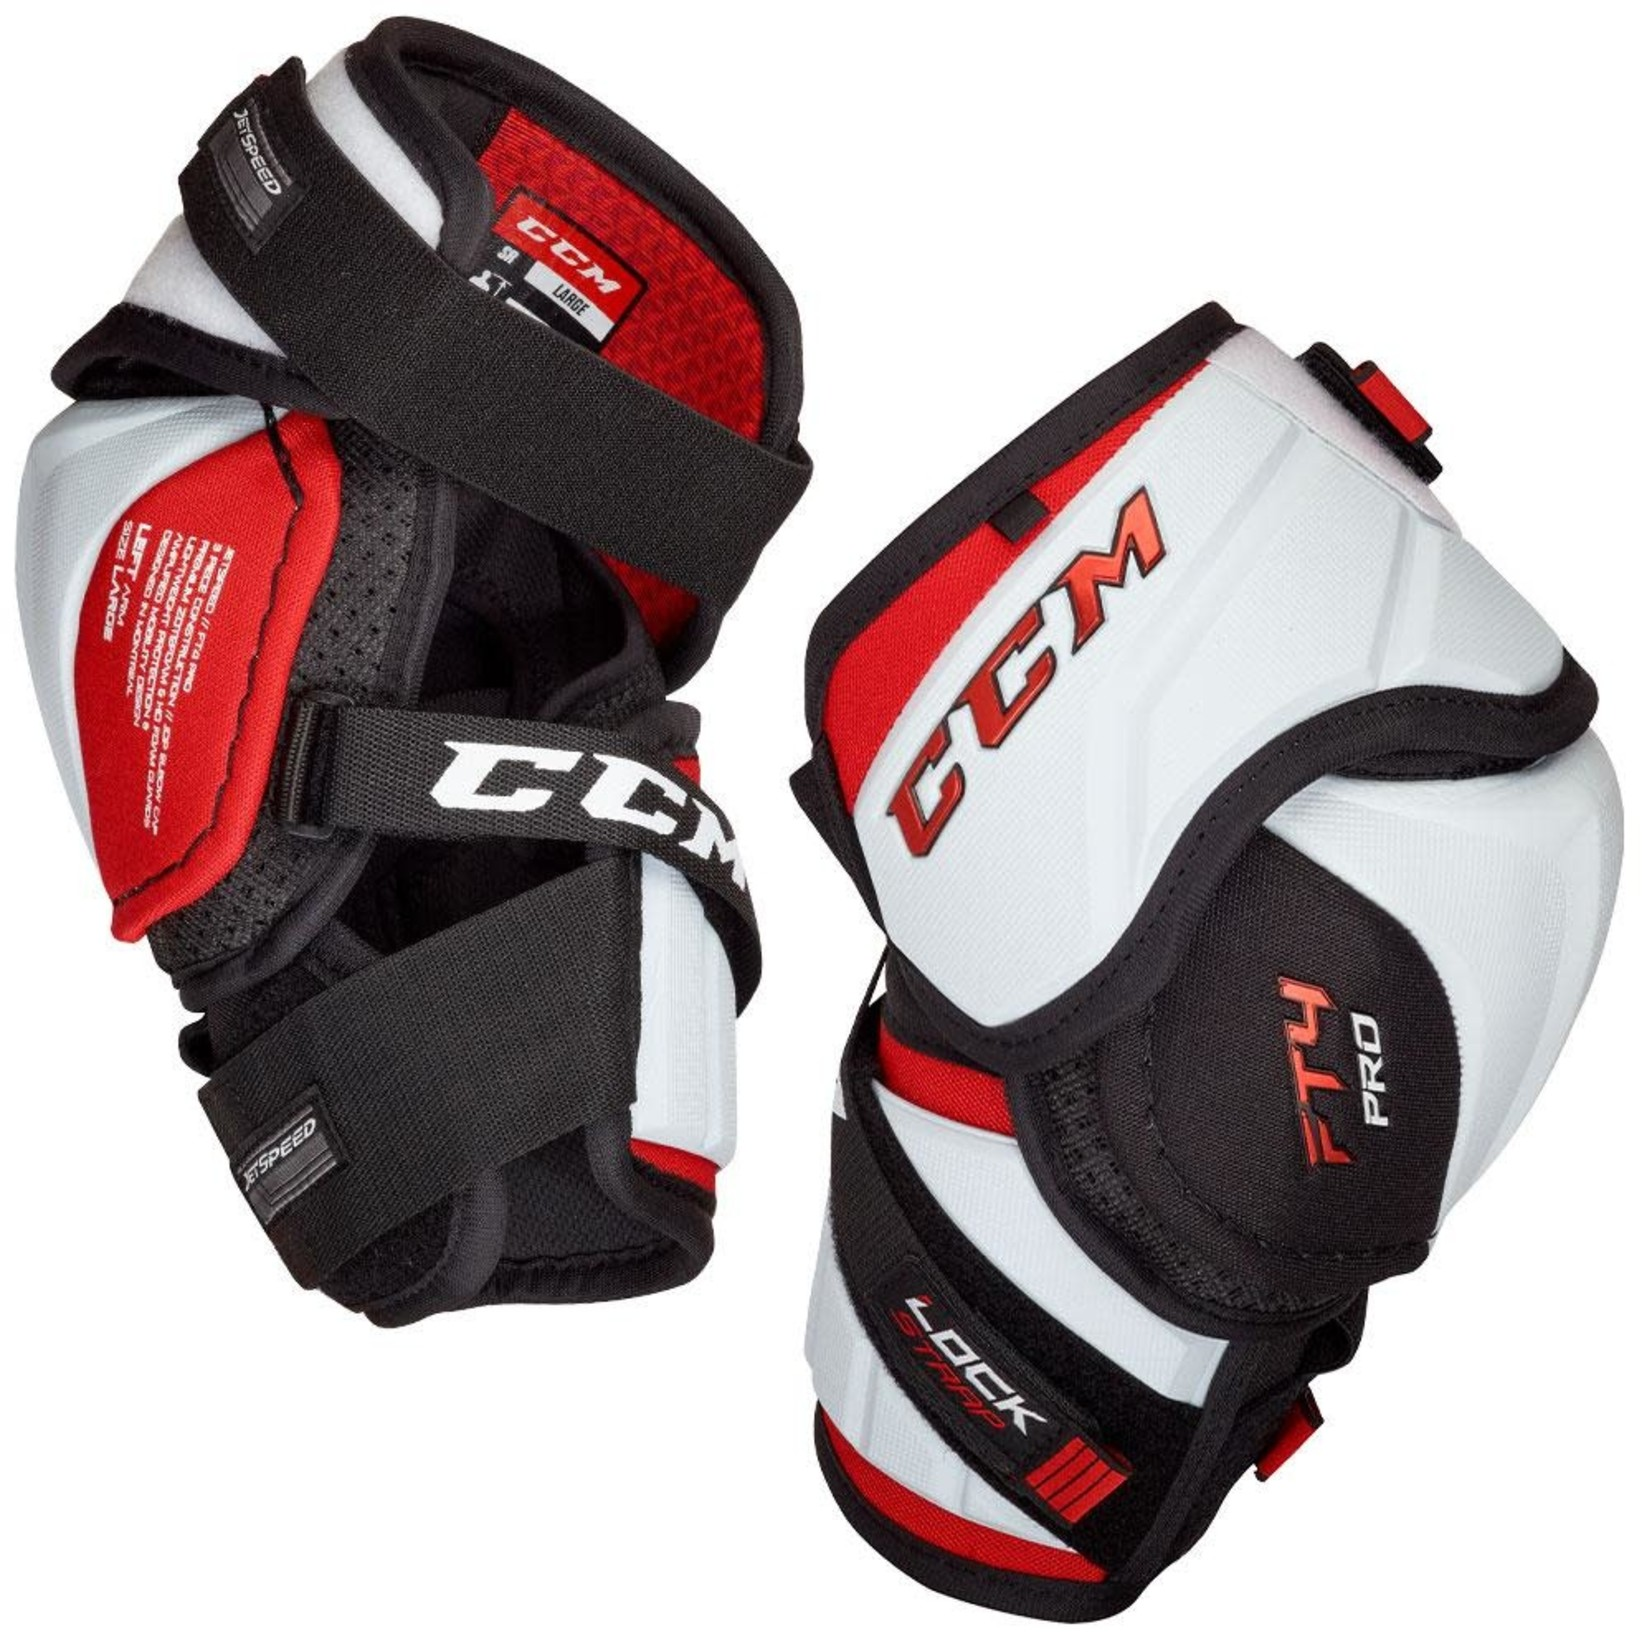 CCM CCM Hockey Elbow Pads, Jetspeed FT4 Pro, Senior